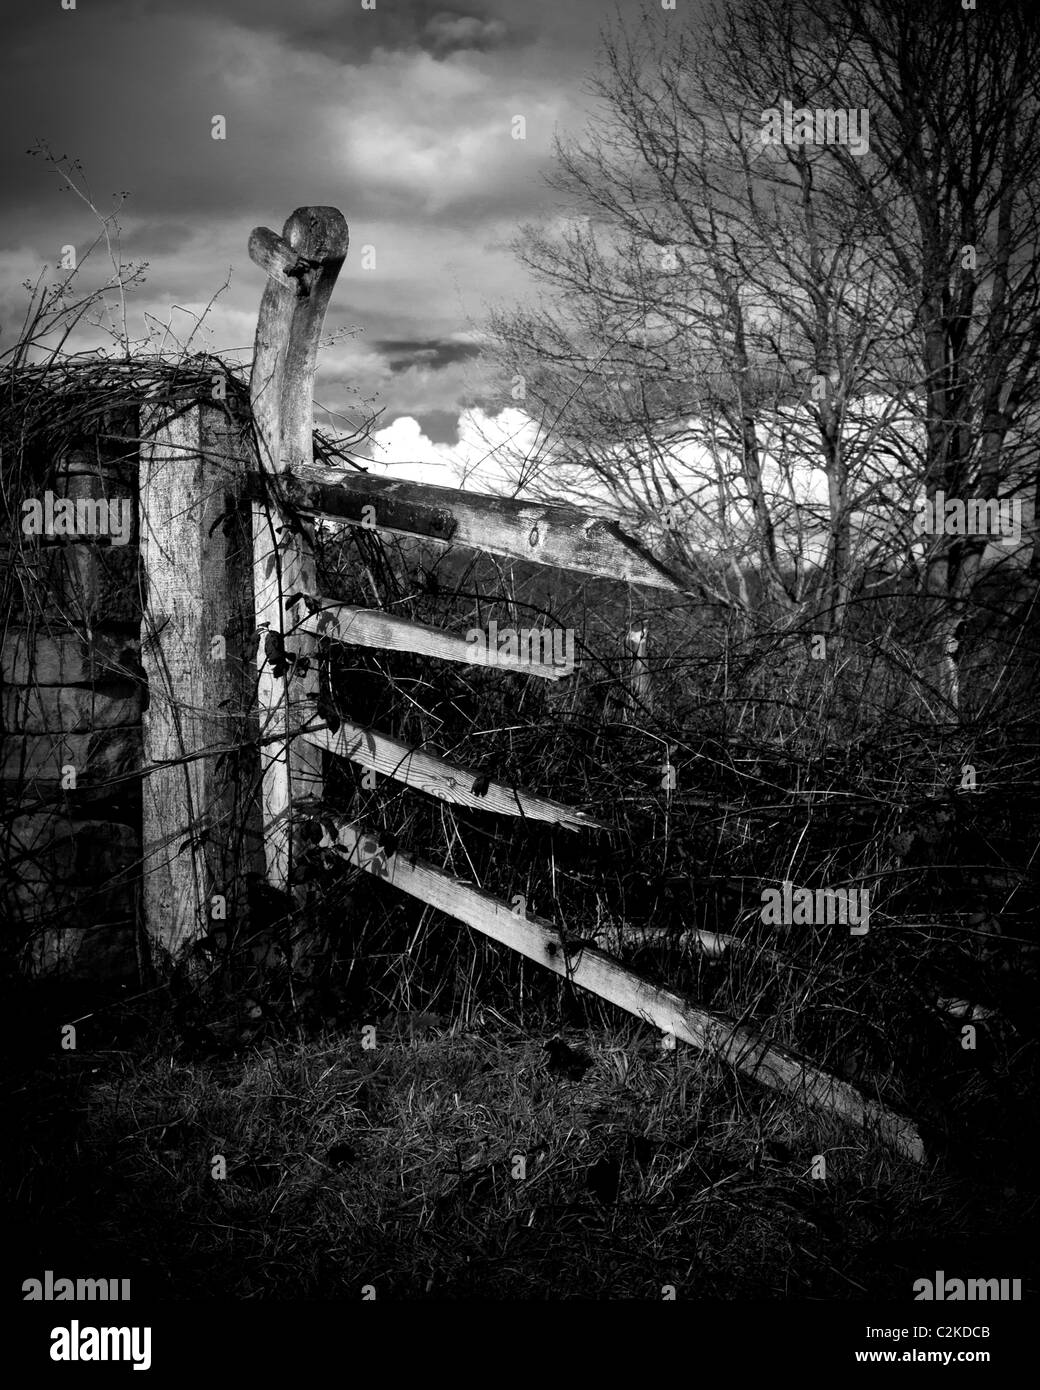 Monochrome image of a broken gate. Stock Photo